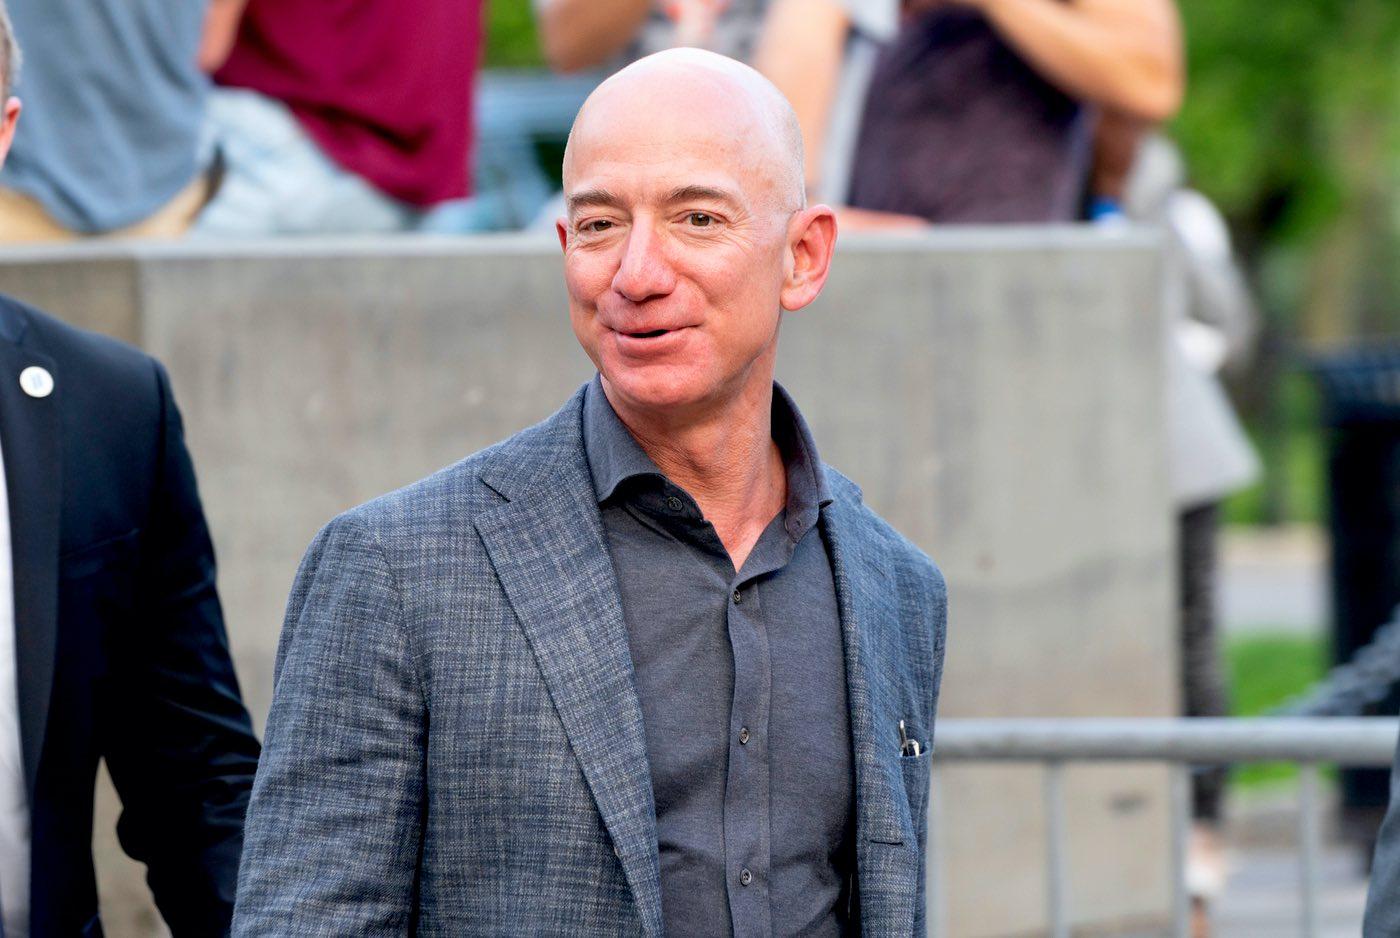 El patrimonio neto de Jeff Bezos supera los $100.000.000.000